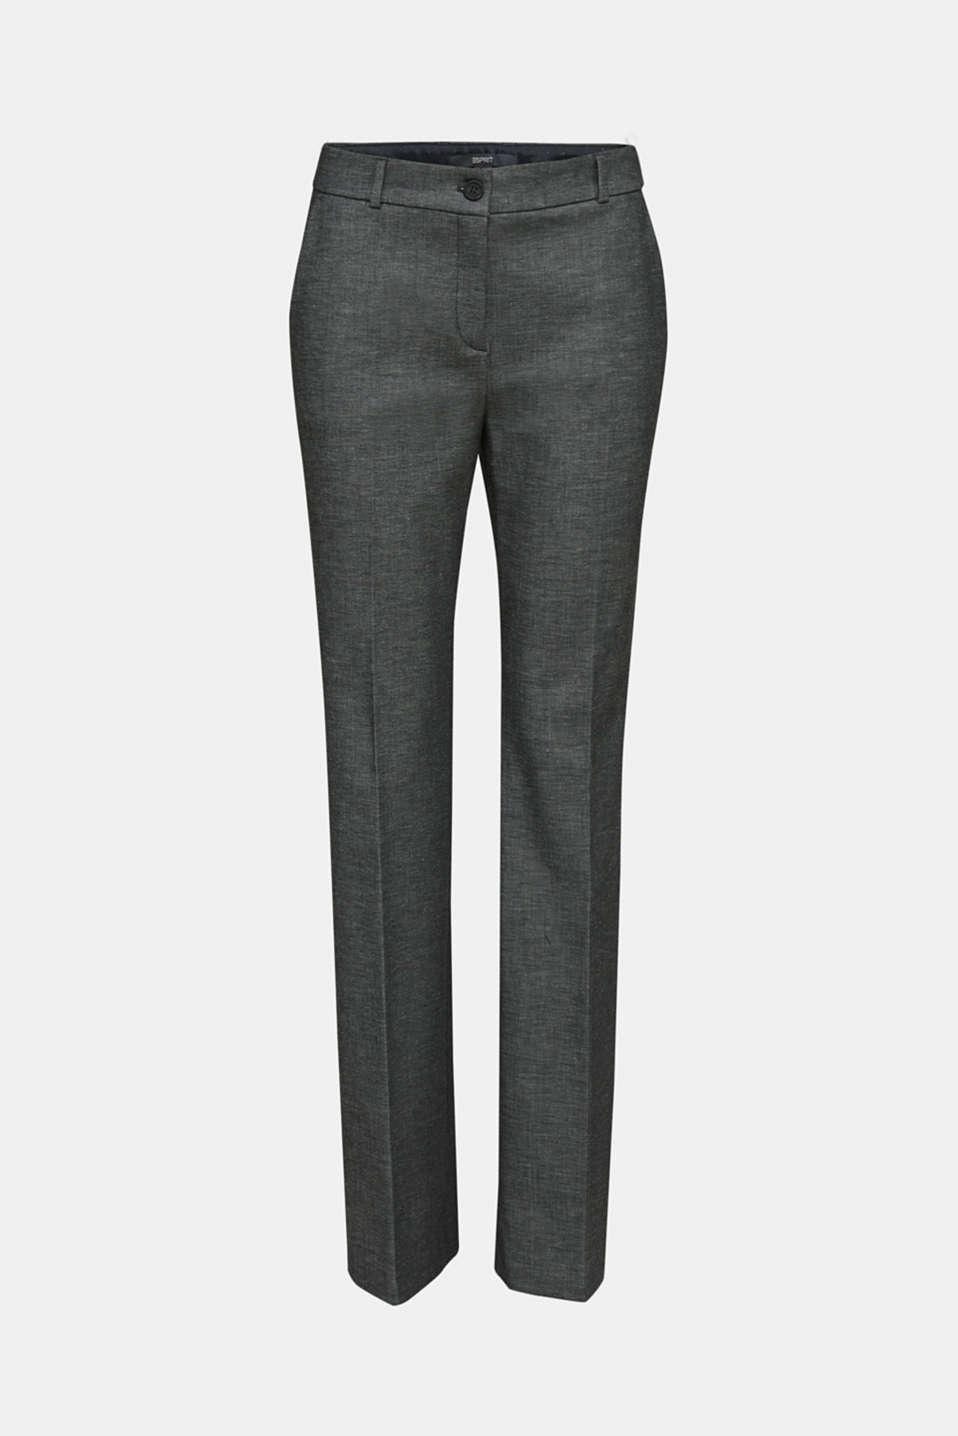 Pants woven, DARK GREY 5, detail image number 7